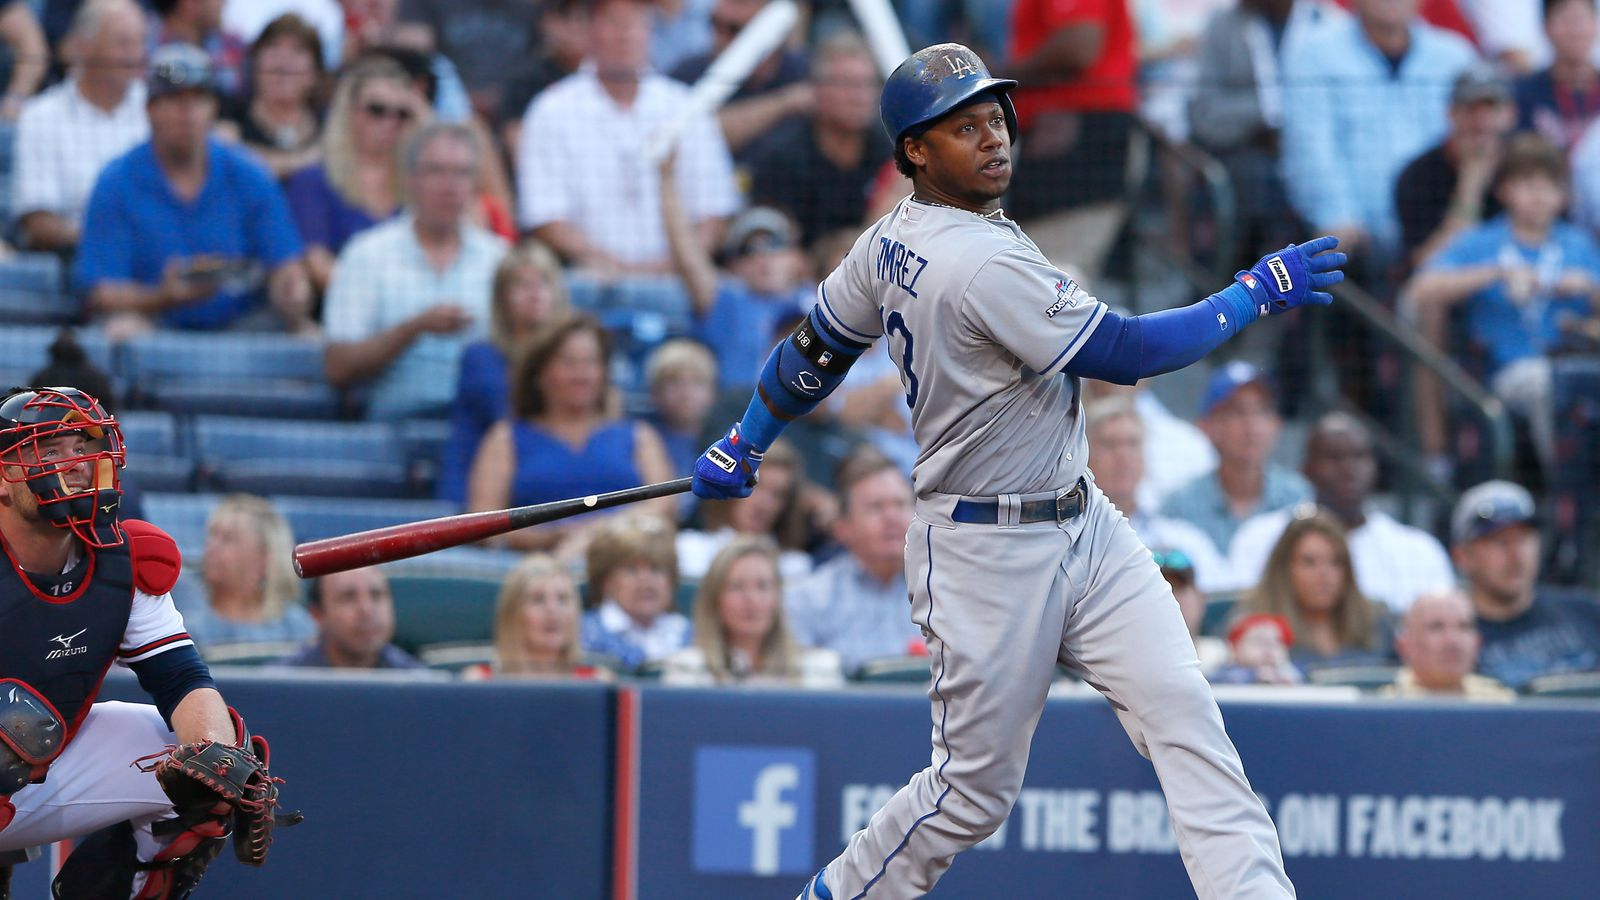 Hanley Ramirez,Andrelton Simmons交易RBI双打,Dodgers-Braves并列1-1